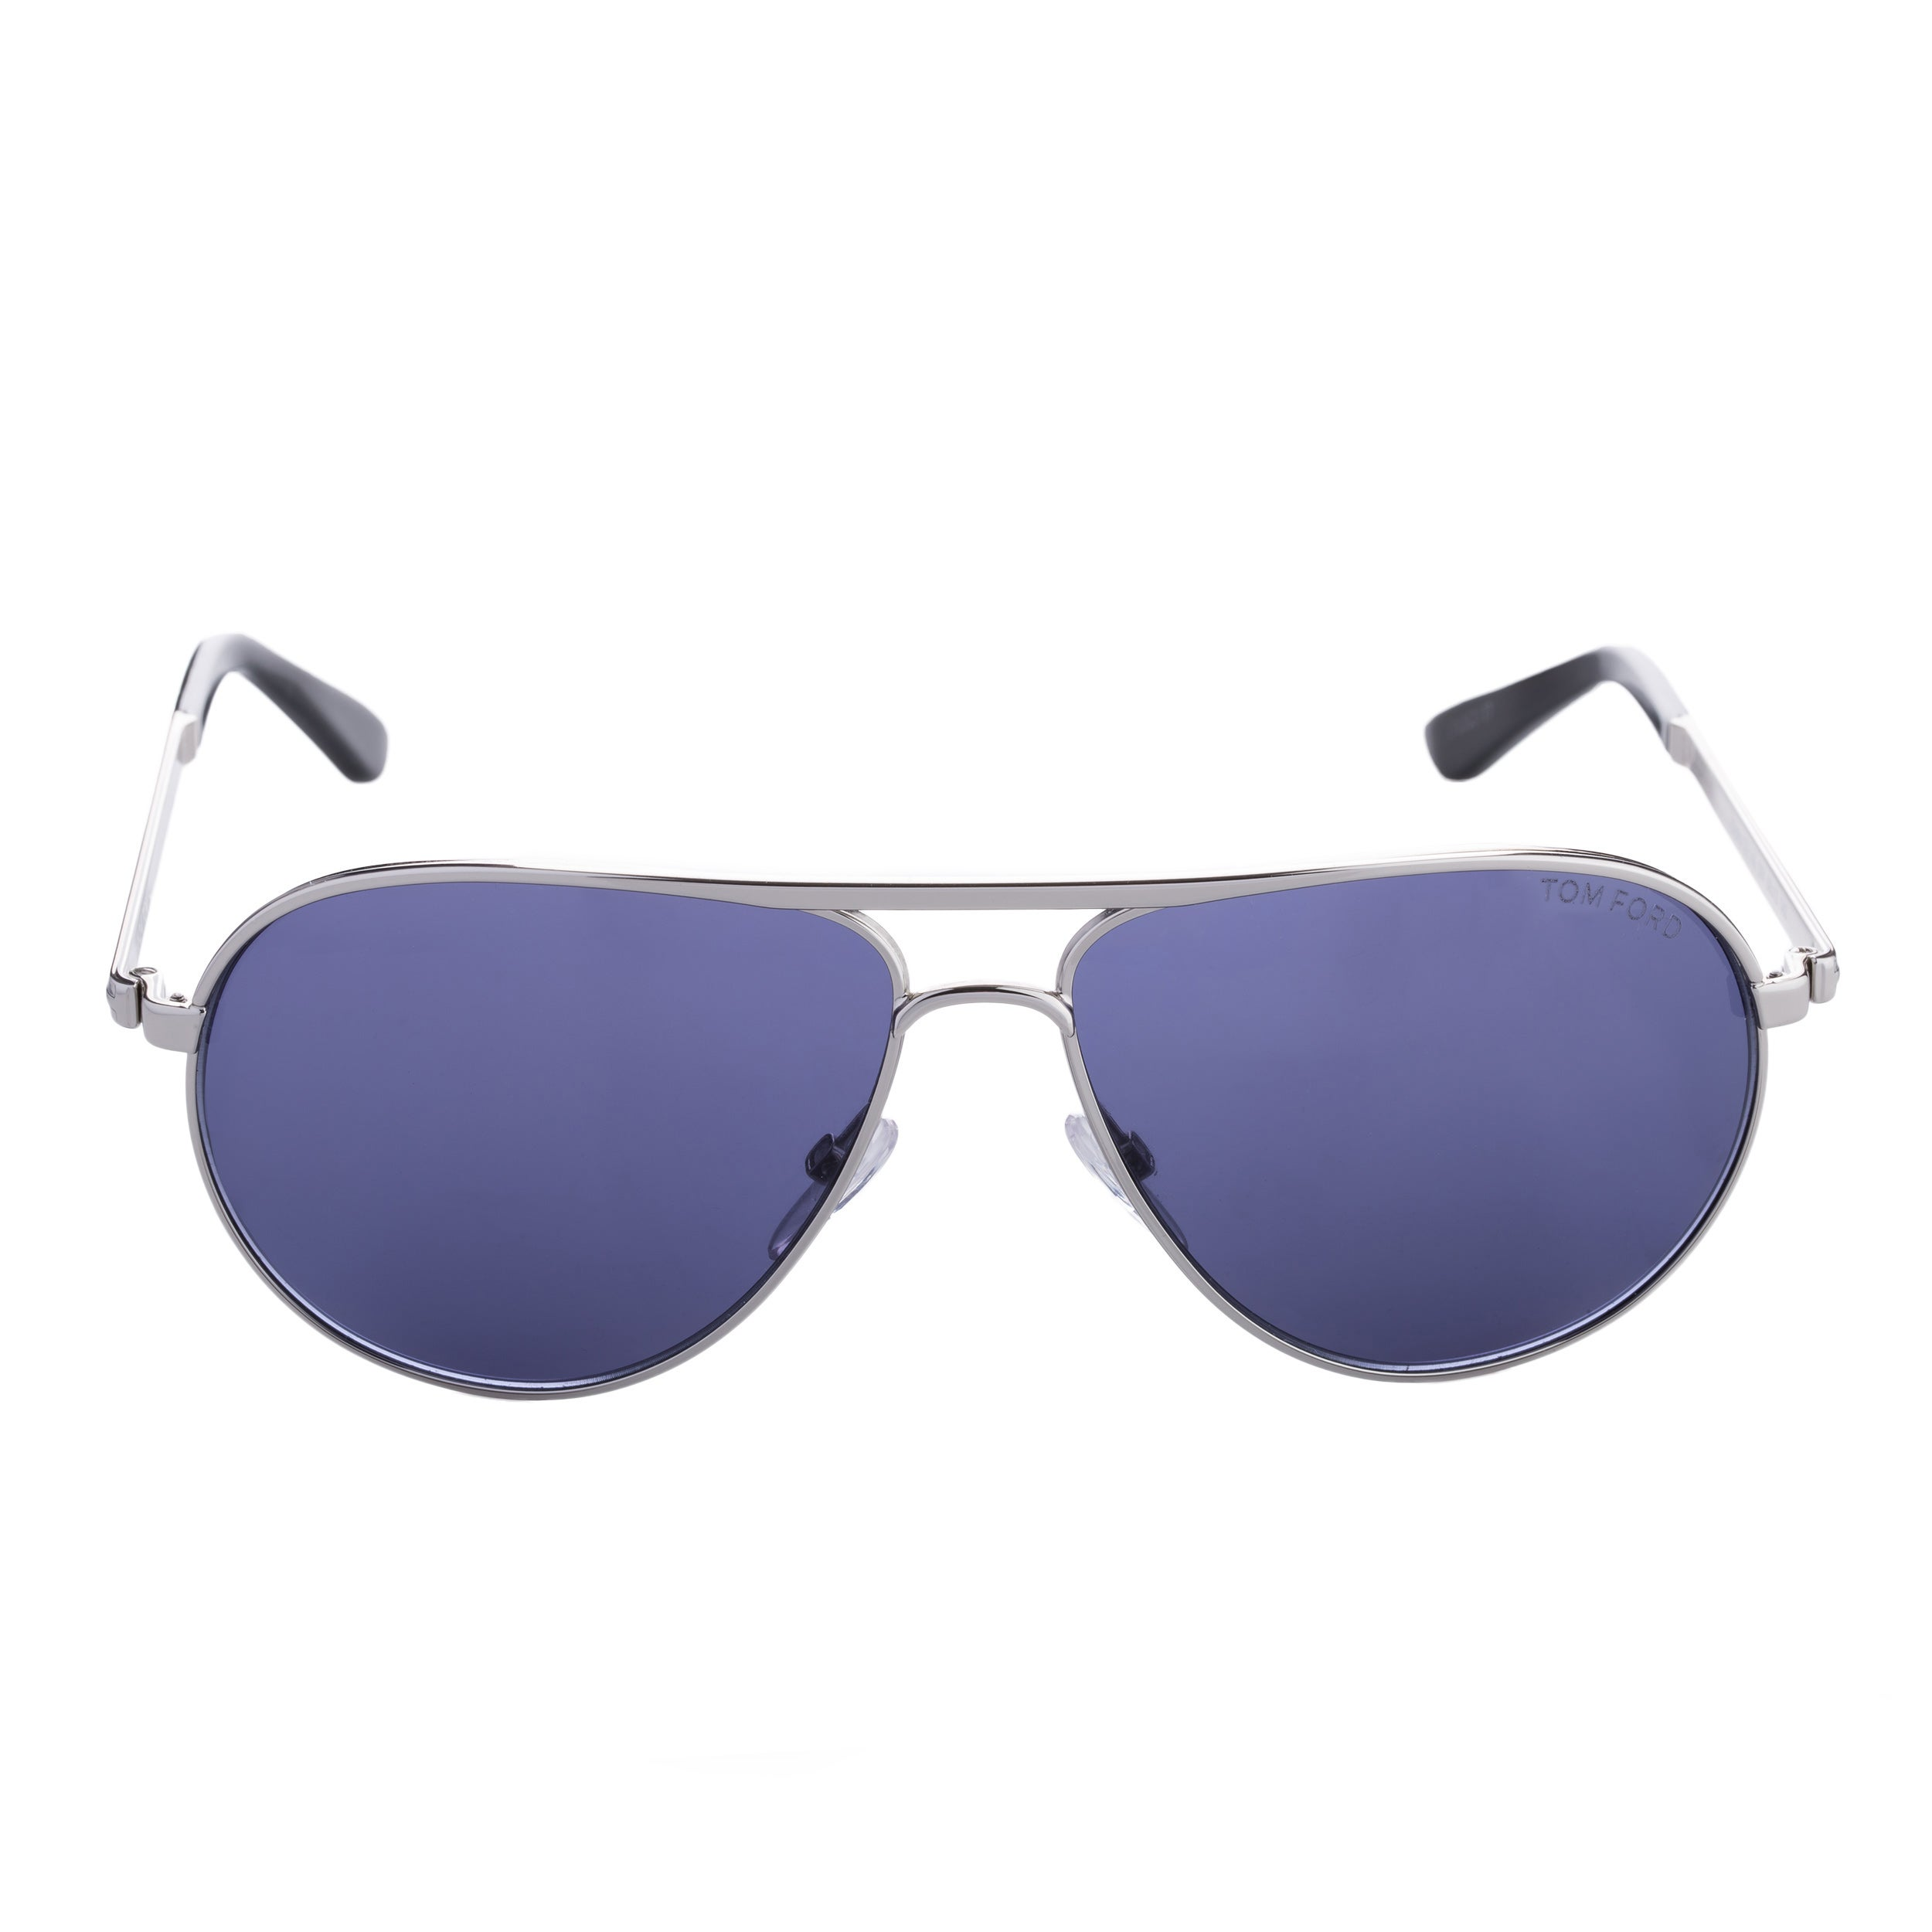 6fb12c31f1 Metal Tom Ford Sunglasses